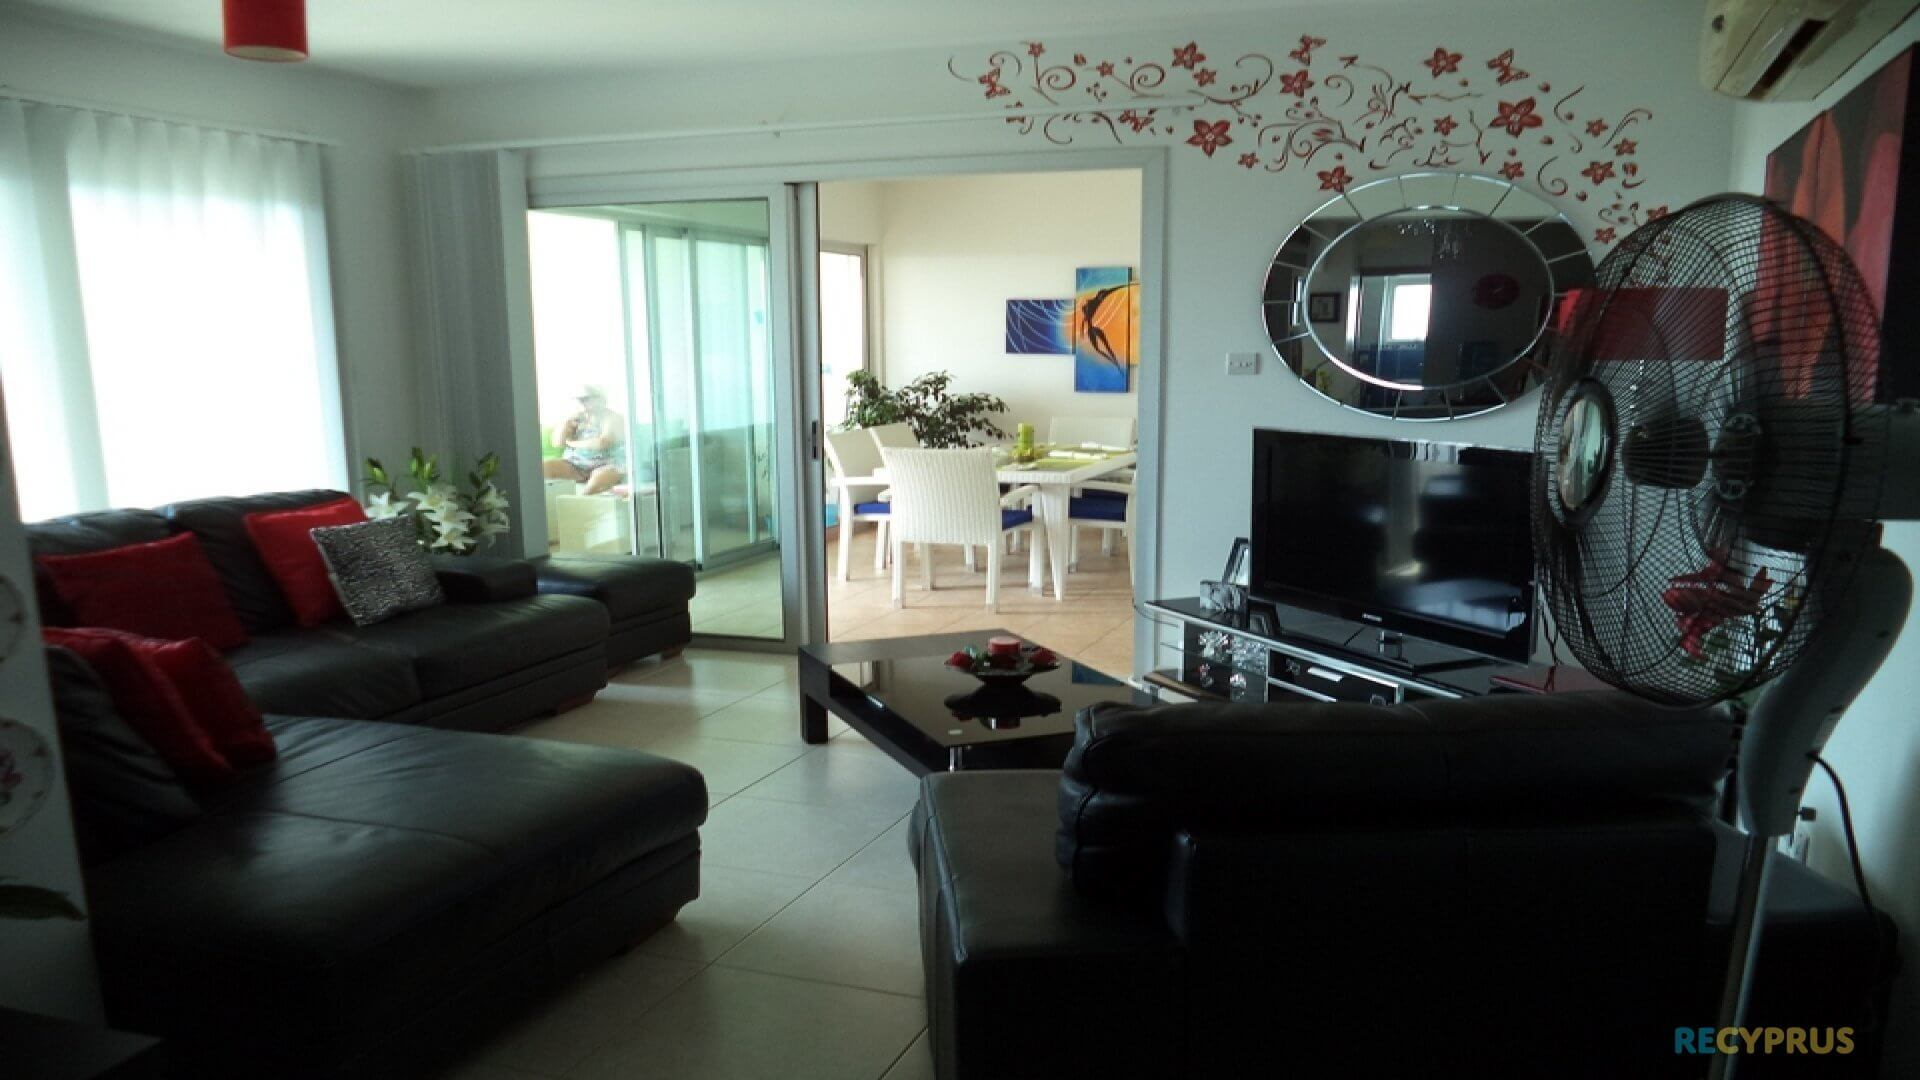 Apartment for sale Kapparis Famagusta Cyprus 4 3463